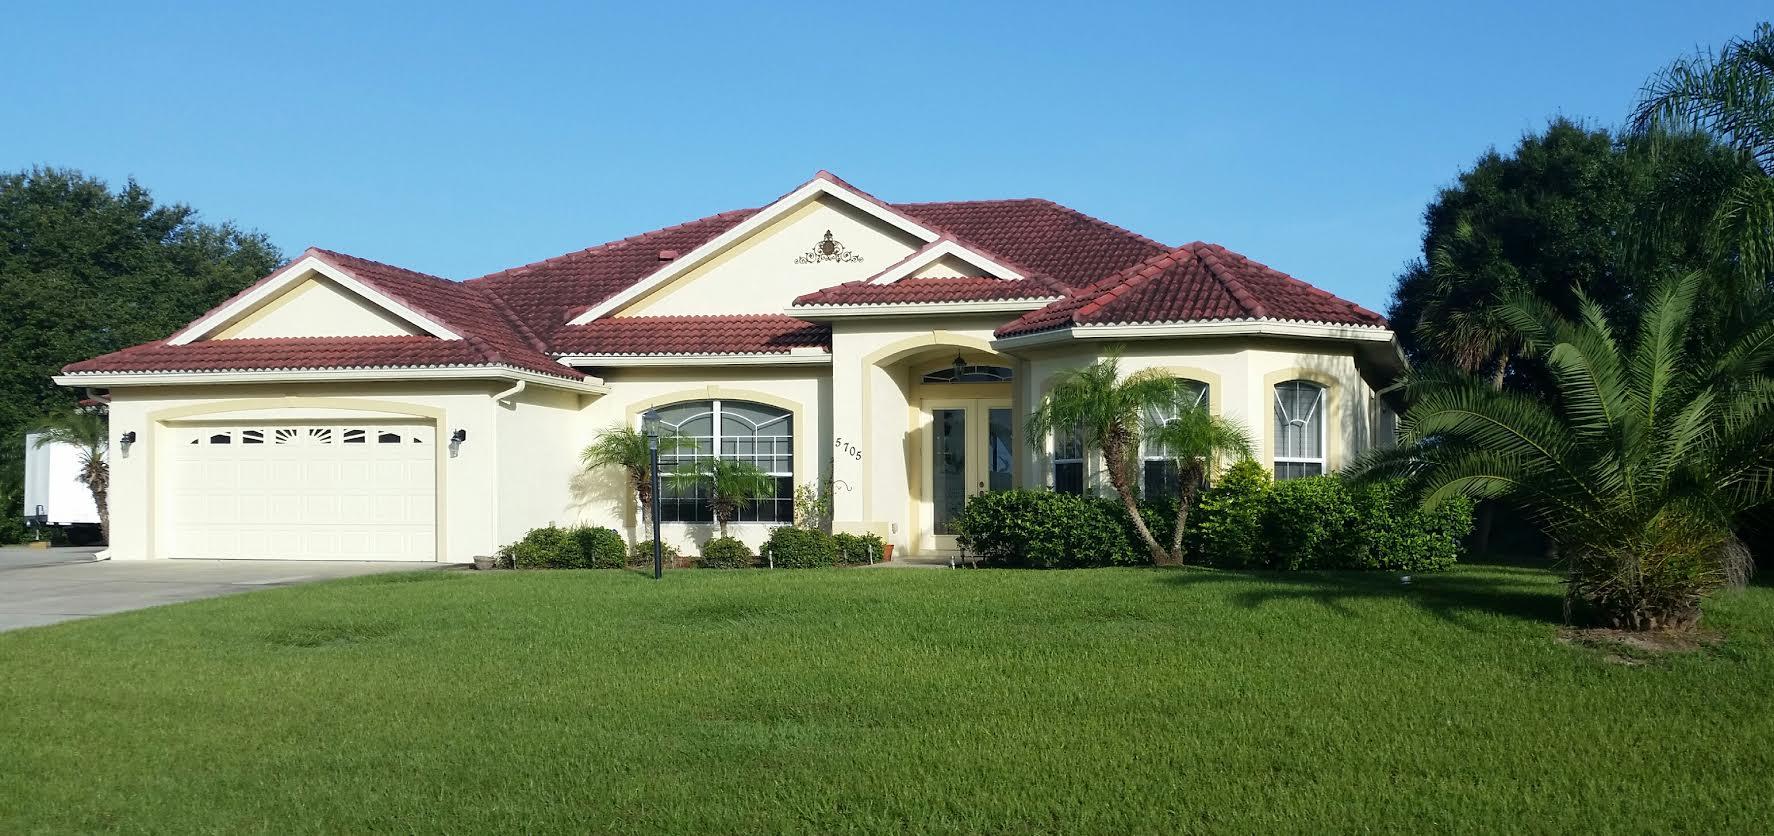 Southwest Florida S Real Estate Boom Newyork Big Sun Realty